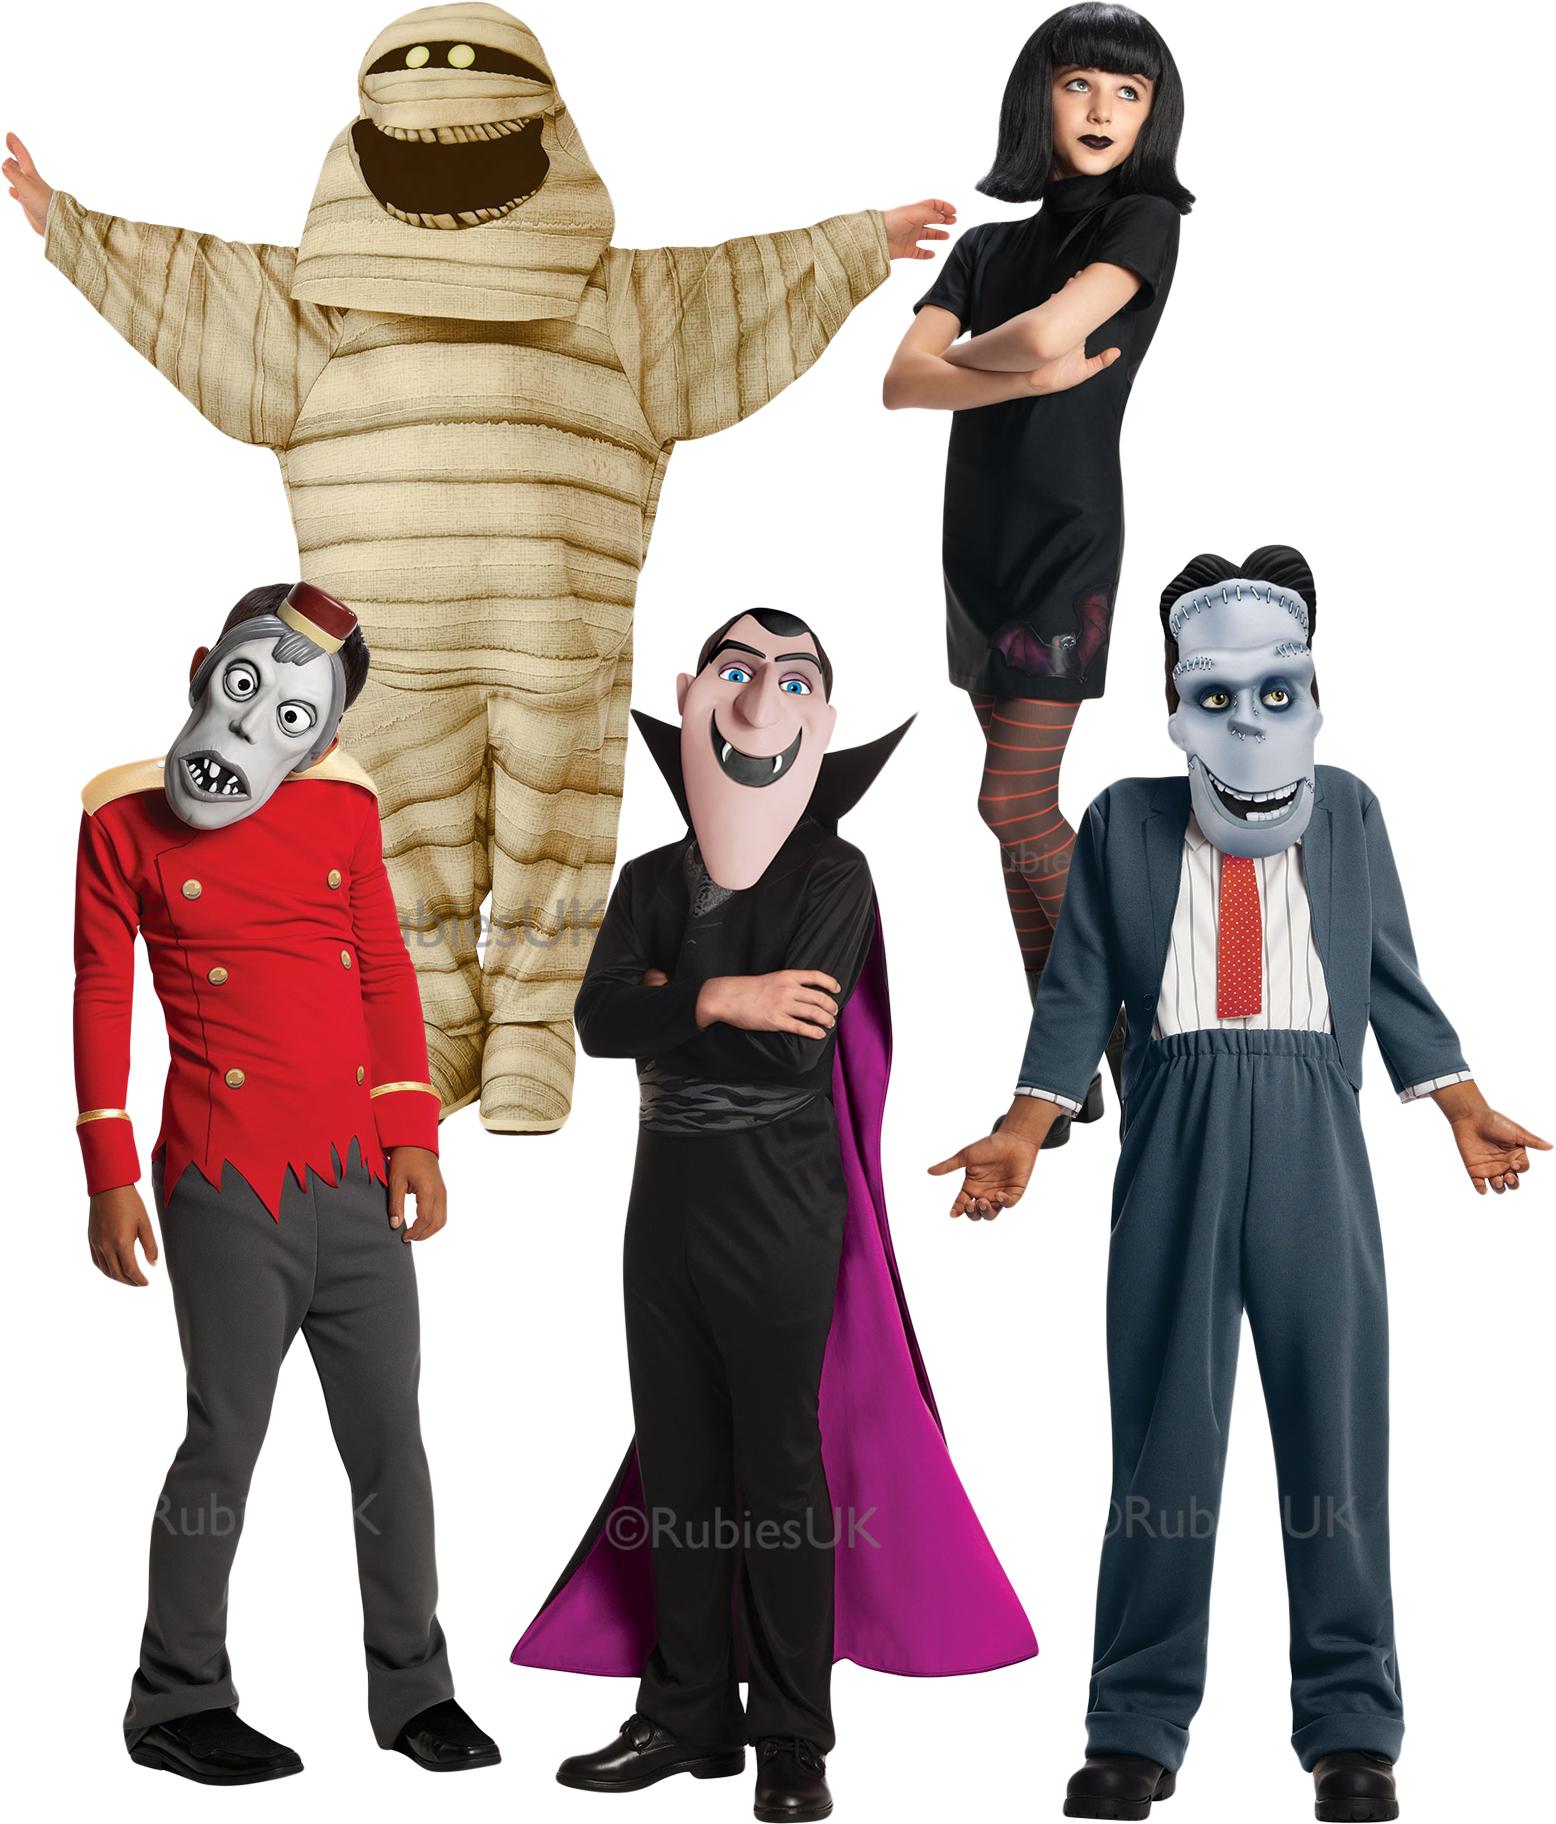 Sentinel Hotel Transylvania 2 Fancy Dress Halloween V&ire Monsters Childrens Costumes  sc 1 st  eBay & Hotel Transylvania 2 Fancy Dress Halloween Vampire Monsters ...